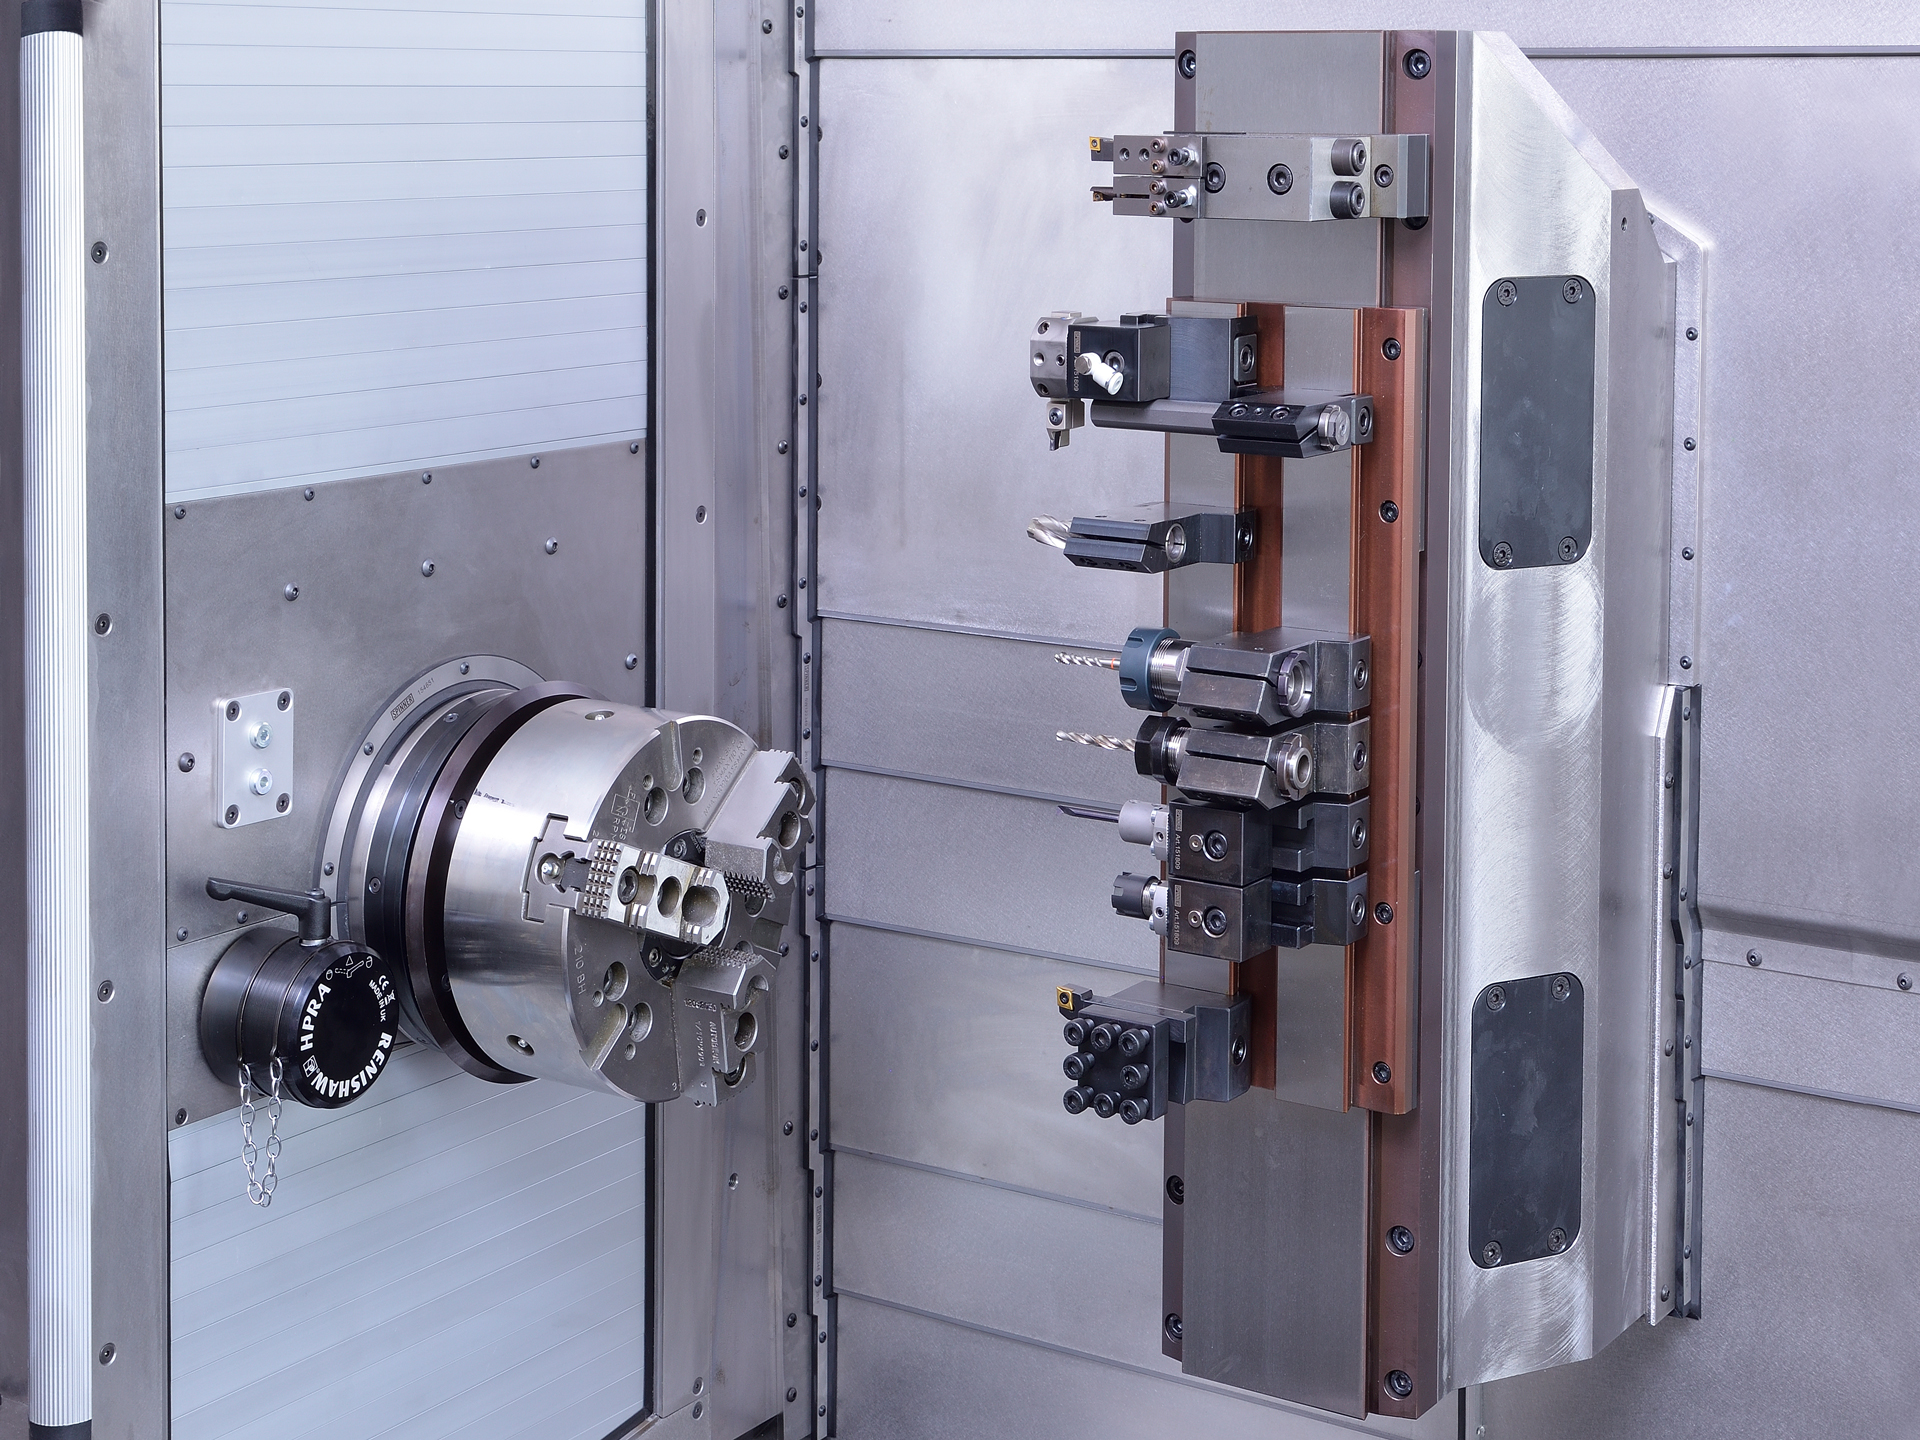 Spinner AG - Ultrapräzisionszentrum Microturn - linearer Werkzeugschlitten